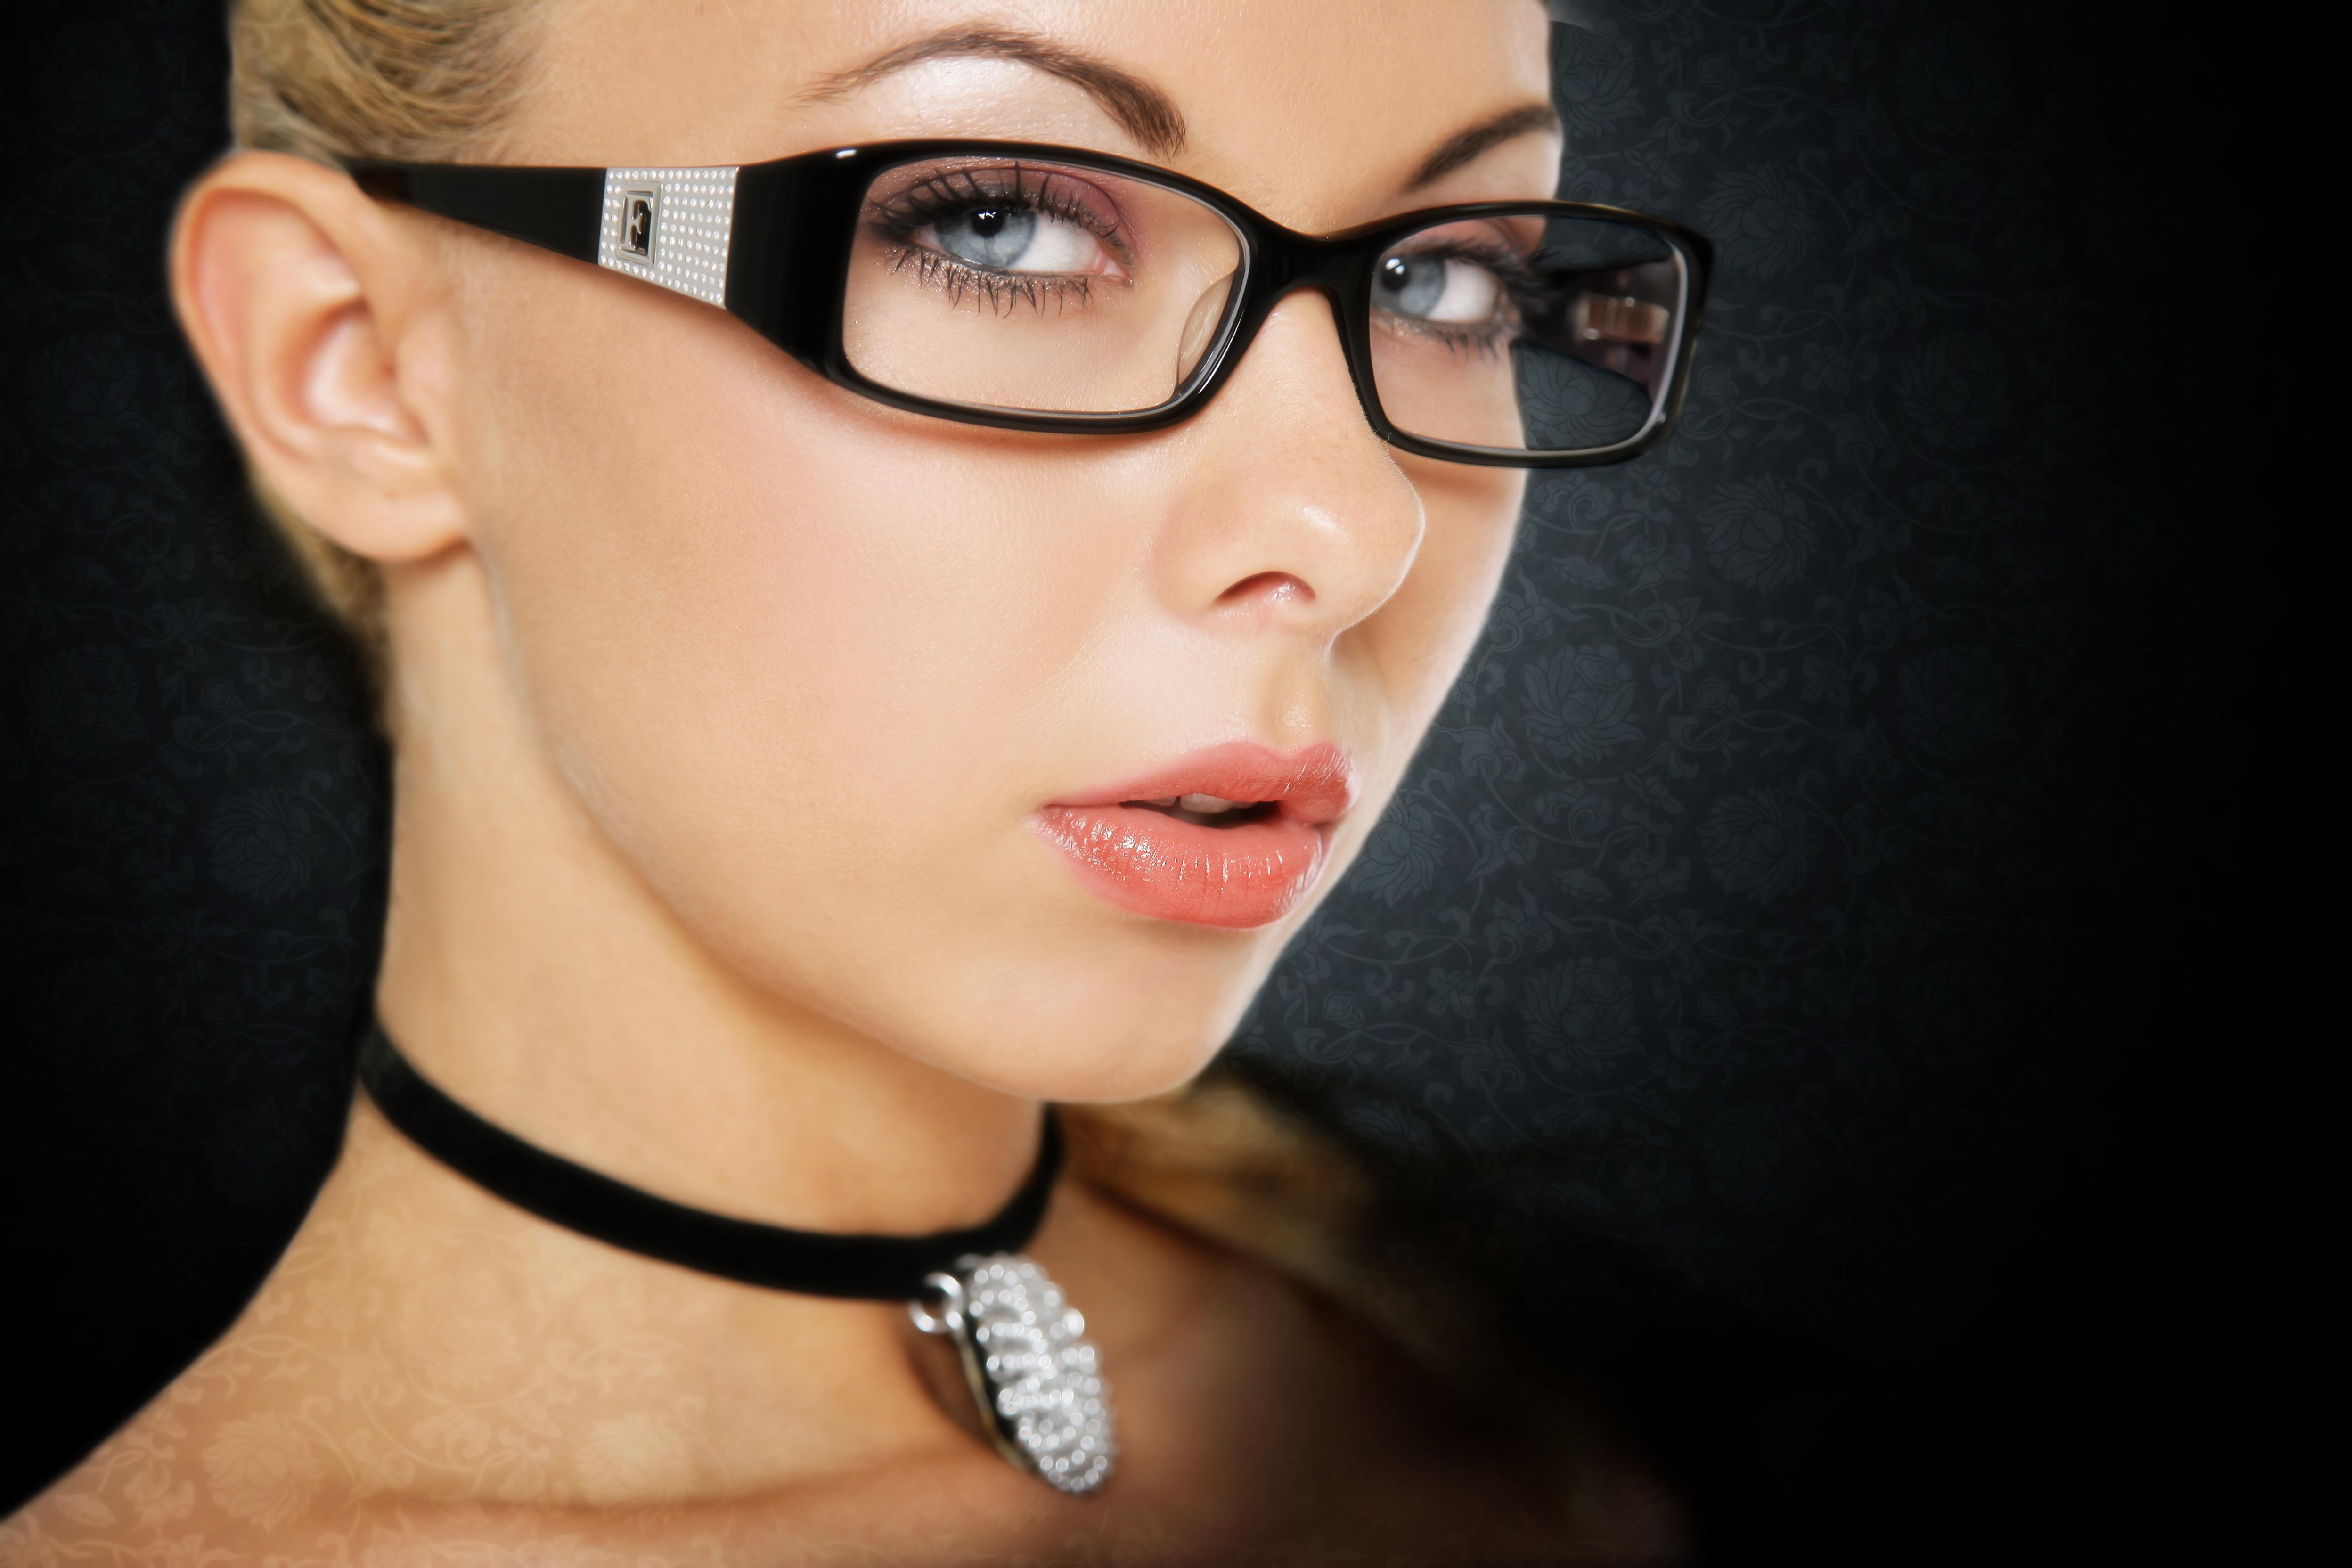 Free Glasses Vr Porn Pics Virtual Reality Xxx